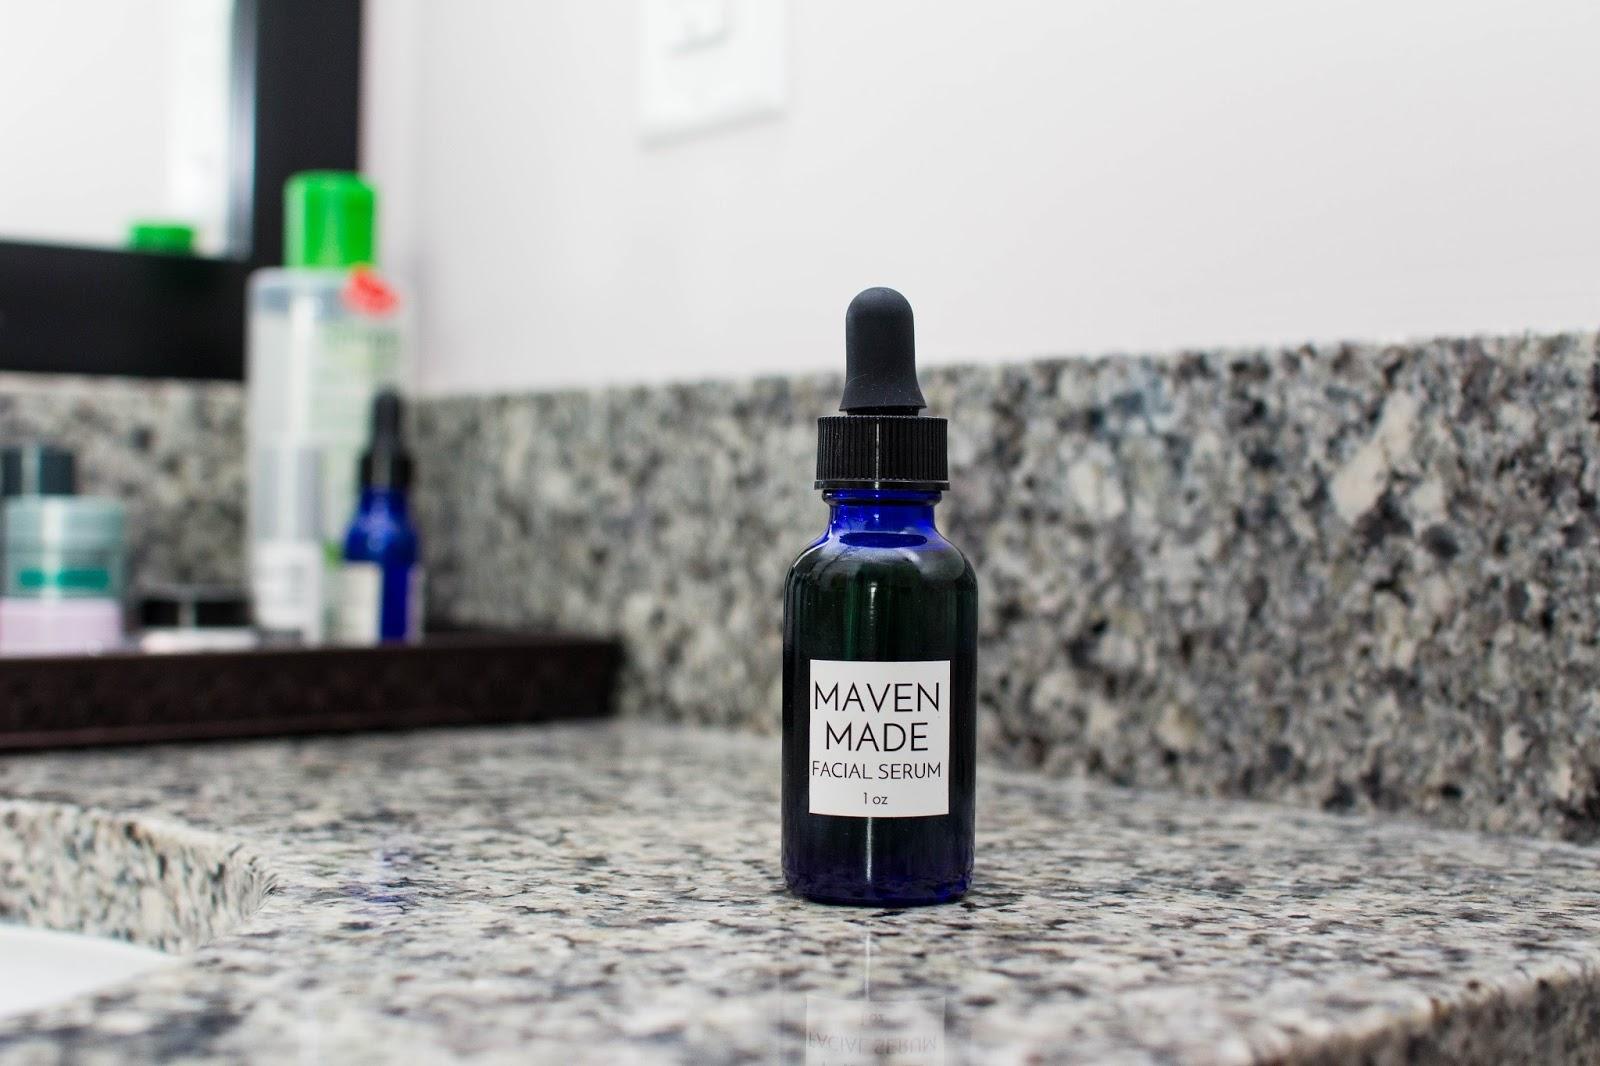 Maven Made Facial Serum skin perfecting serum |  | A.Viza Style